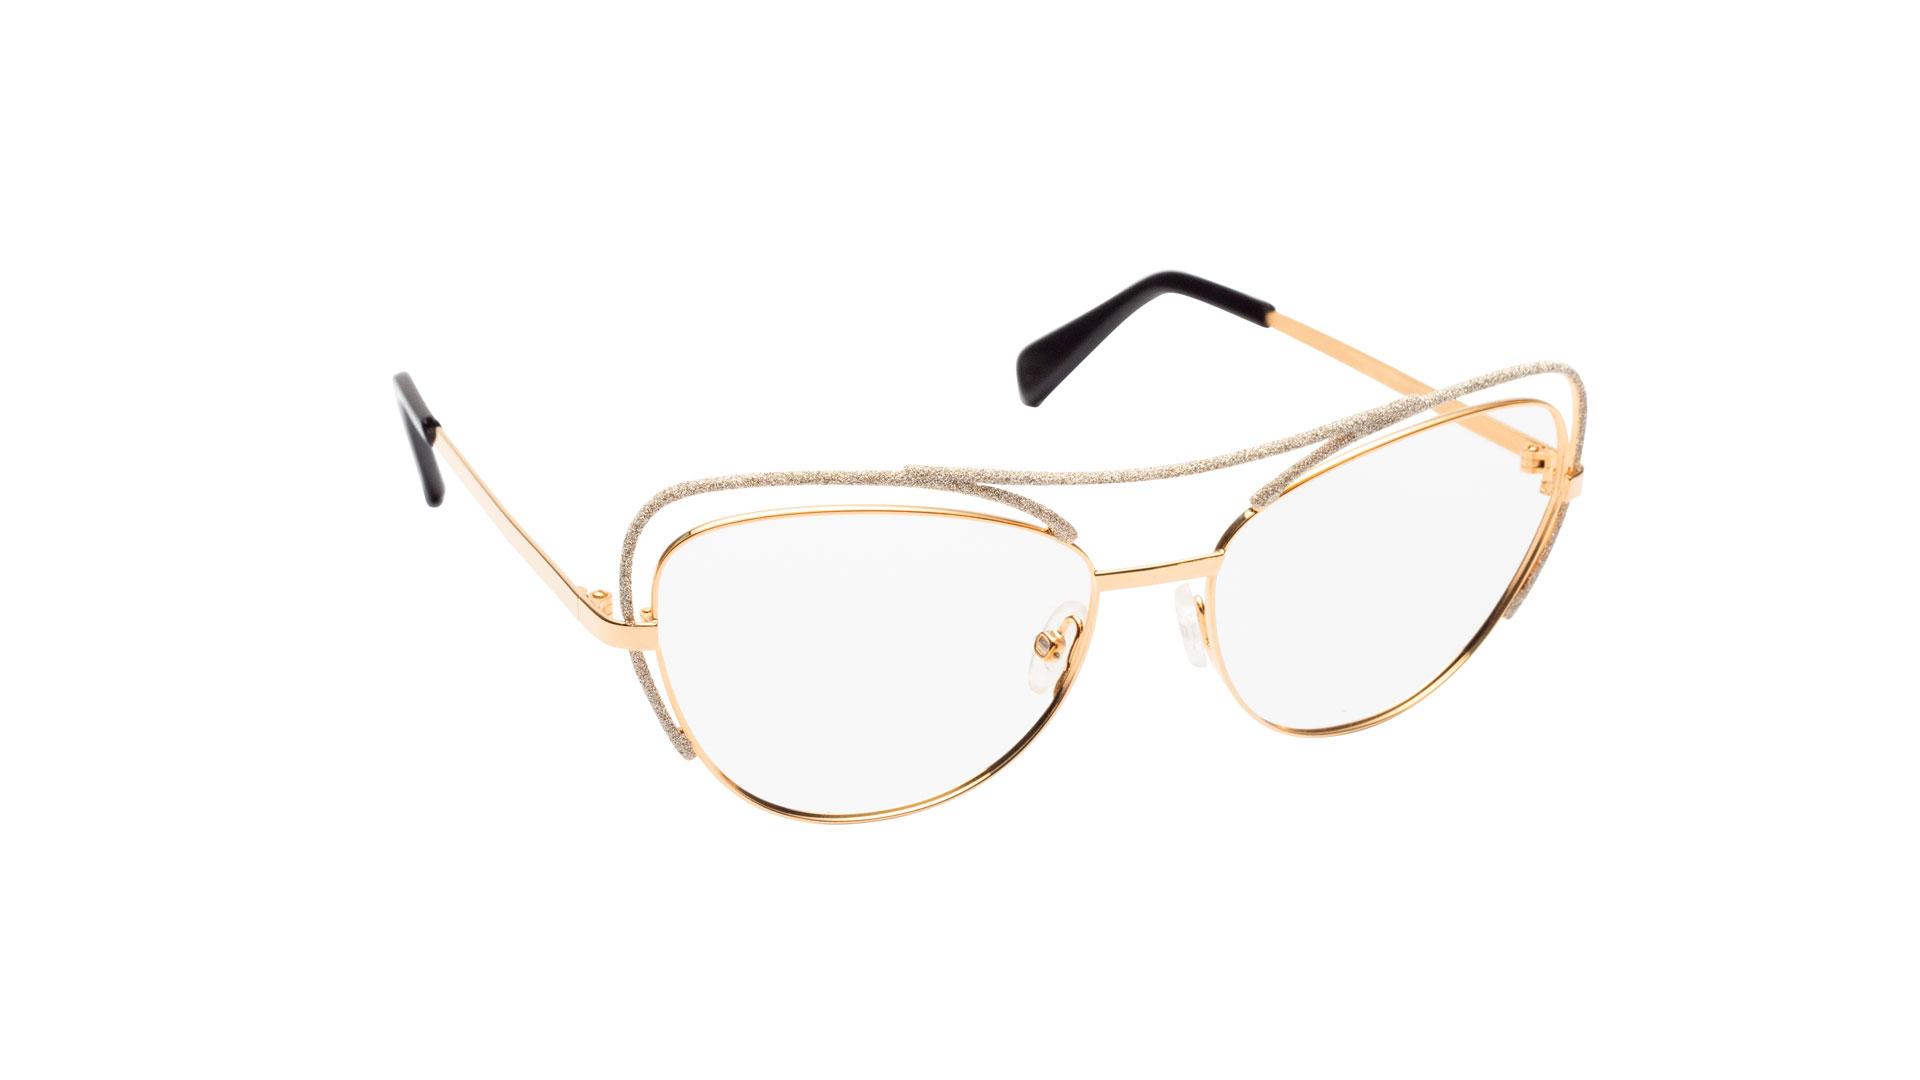 Imagen de las gafas de la diseñadora italiana Lara D'